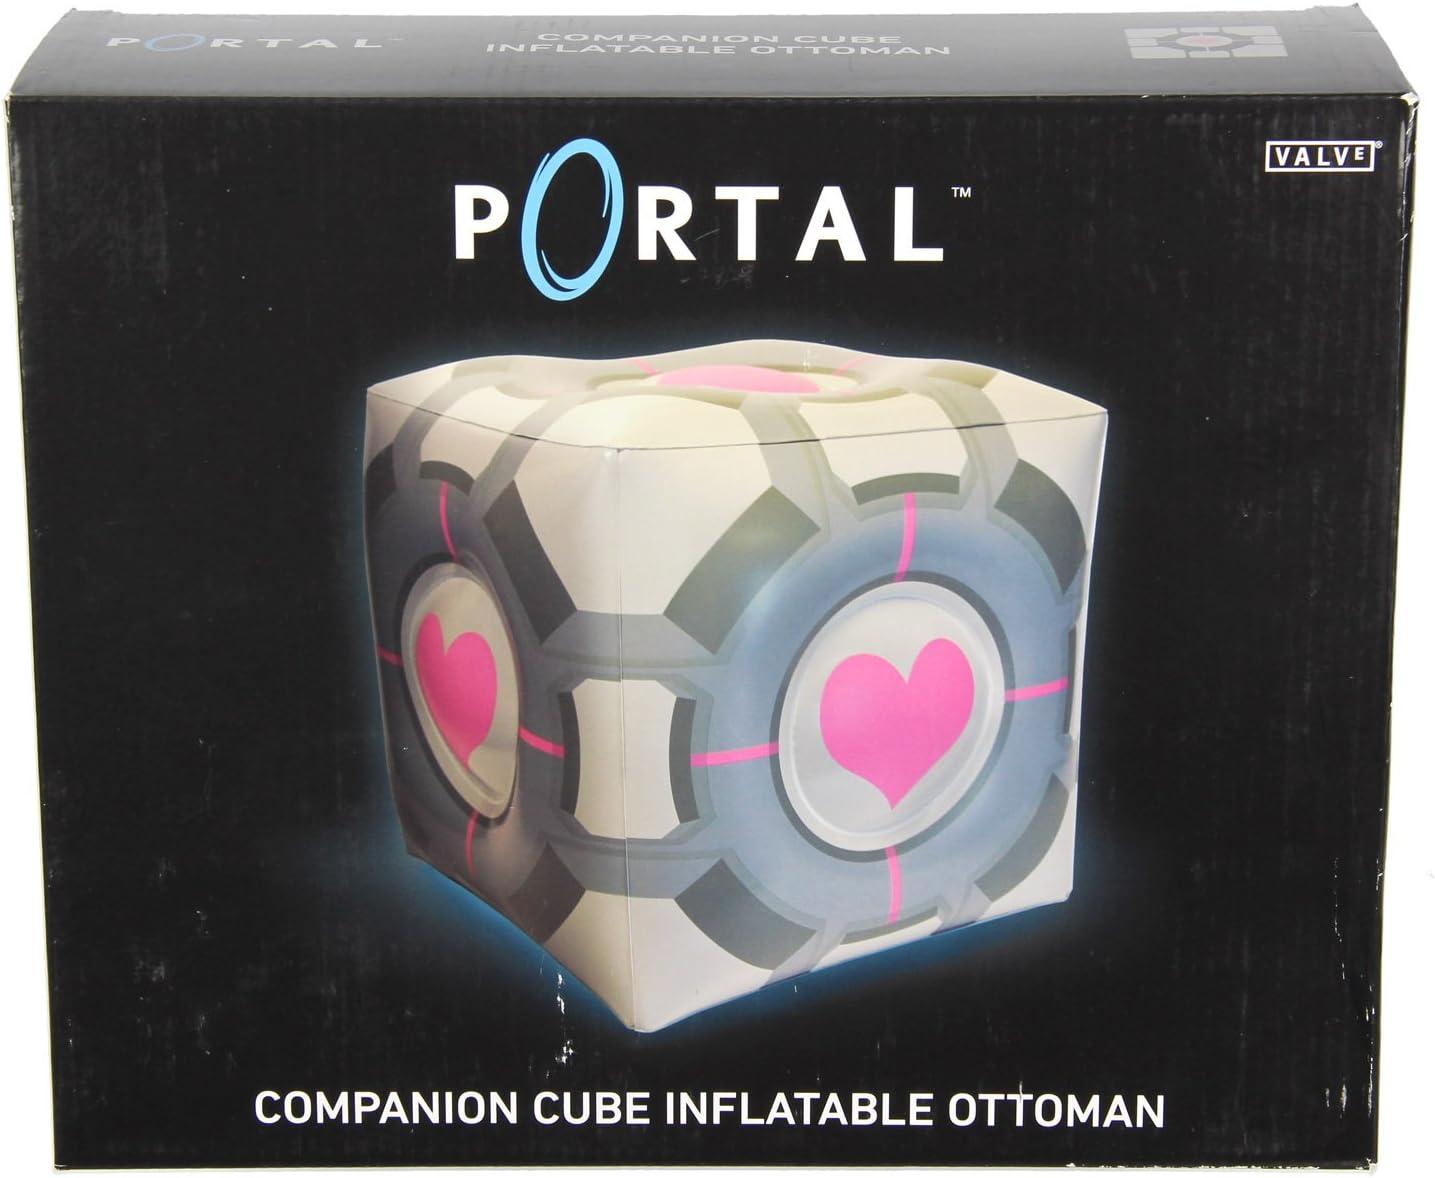 Portail Original Companion Cube Inflatable ottoman